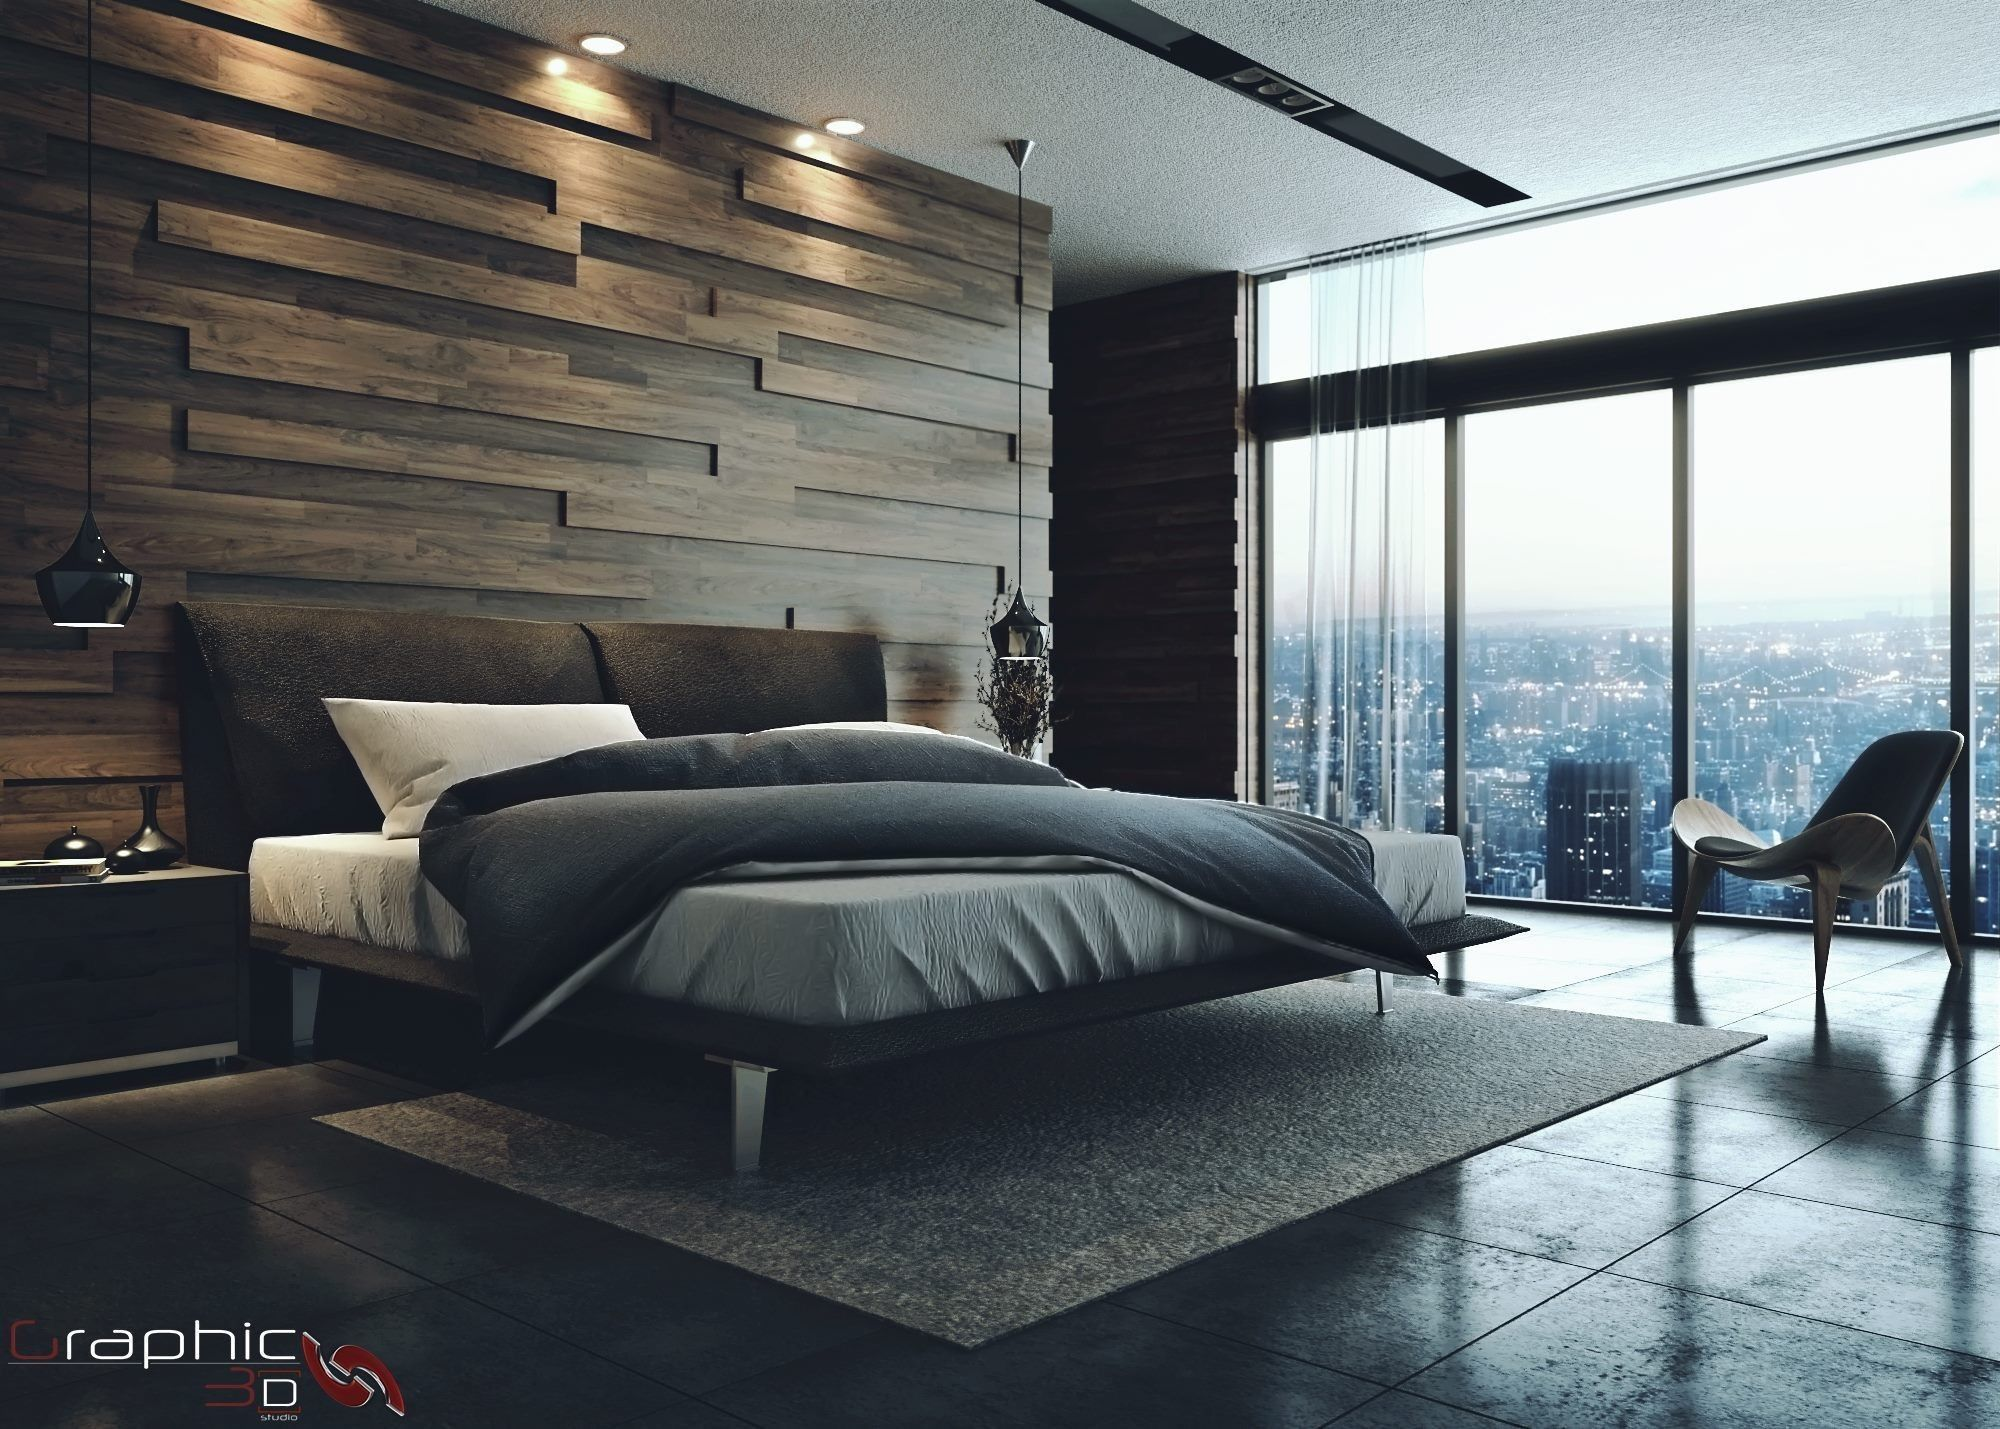 Pin By Yan Shuba On Home Decor Pinterest Luxurious Bedrooms Home Bedroom Modern Bedroom